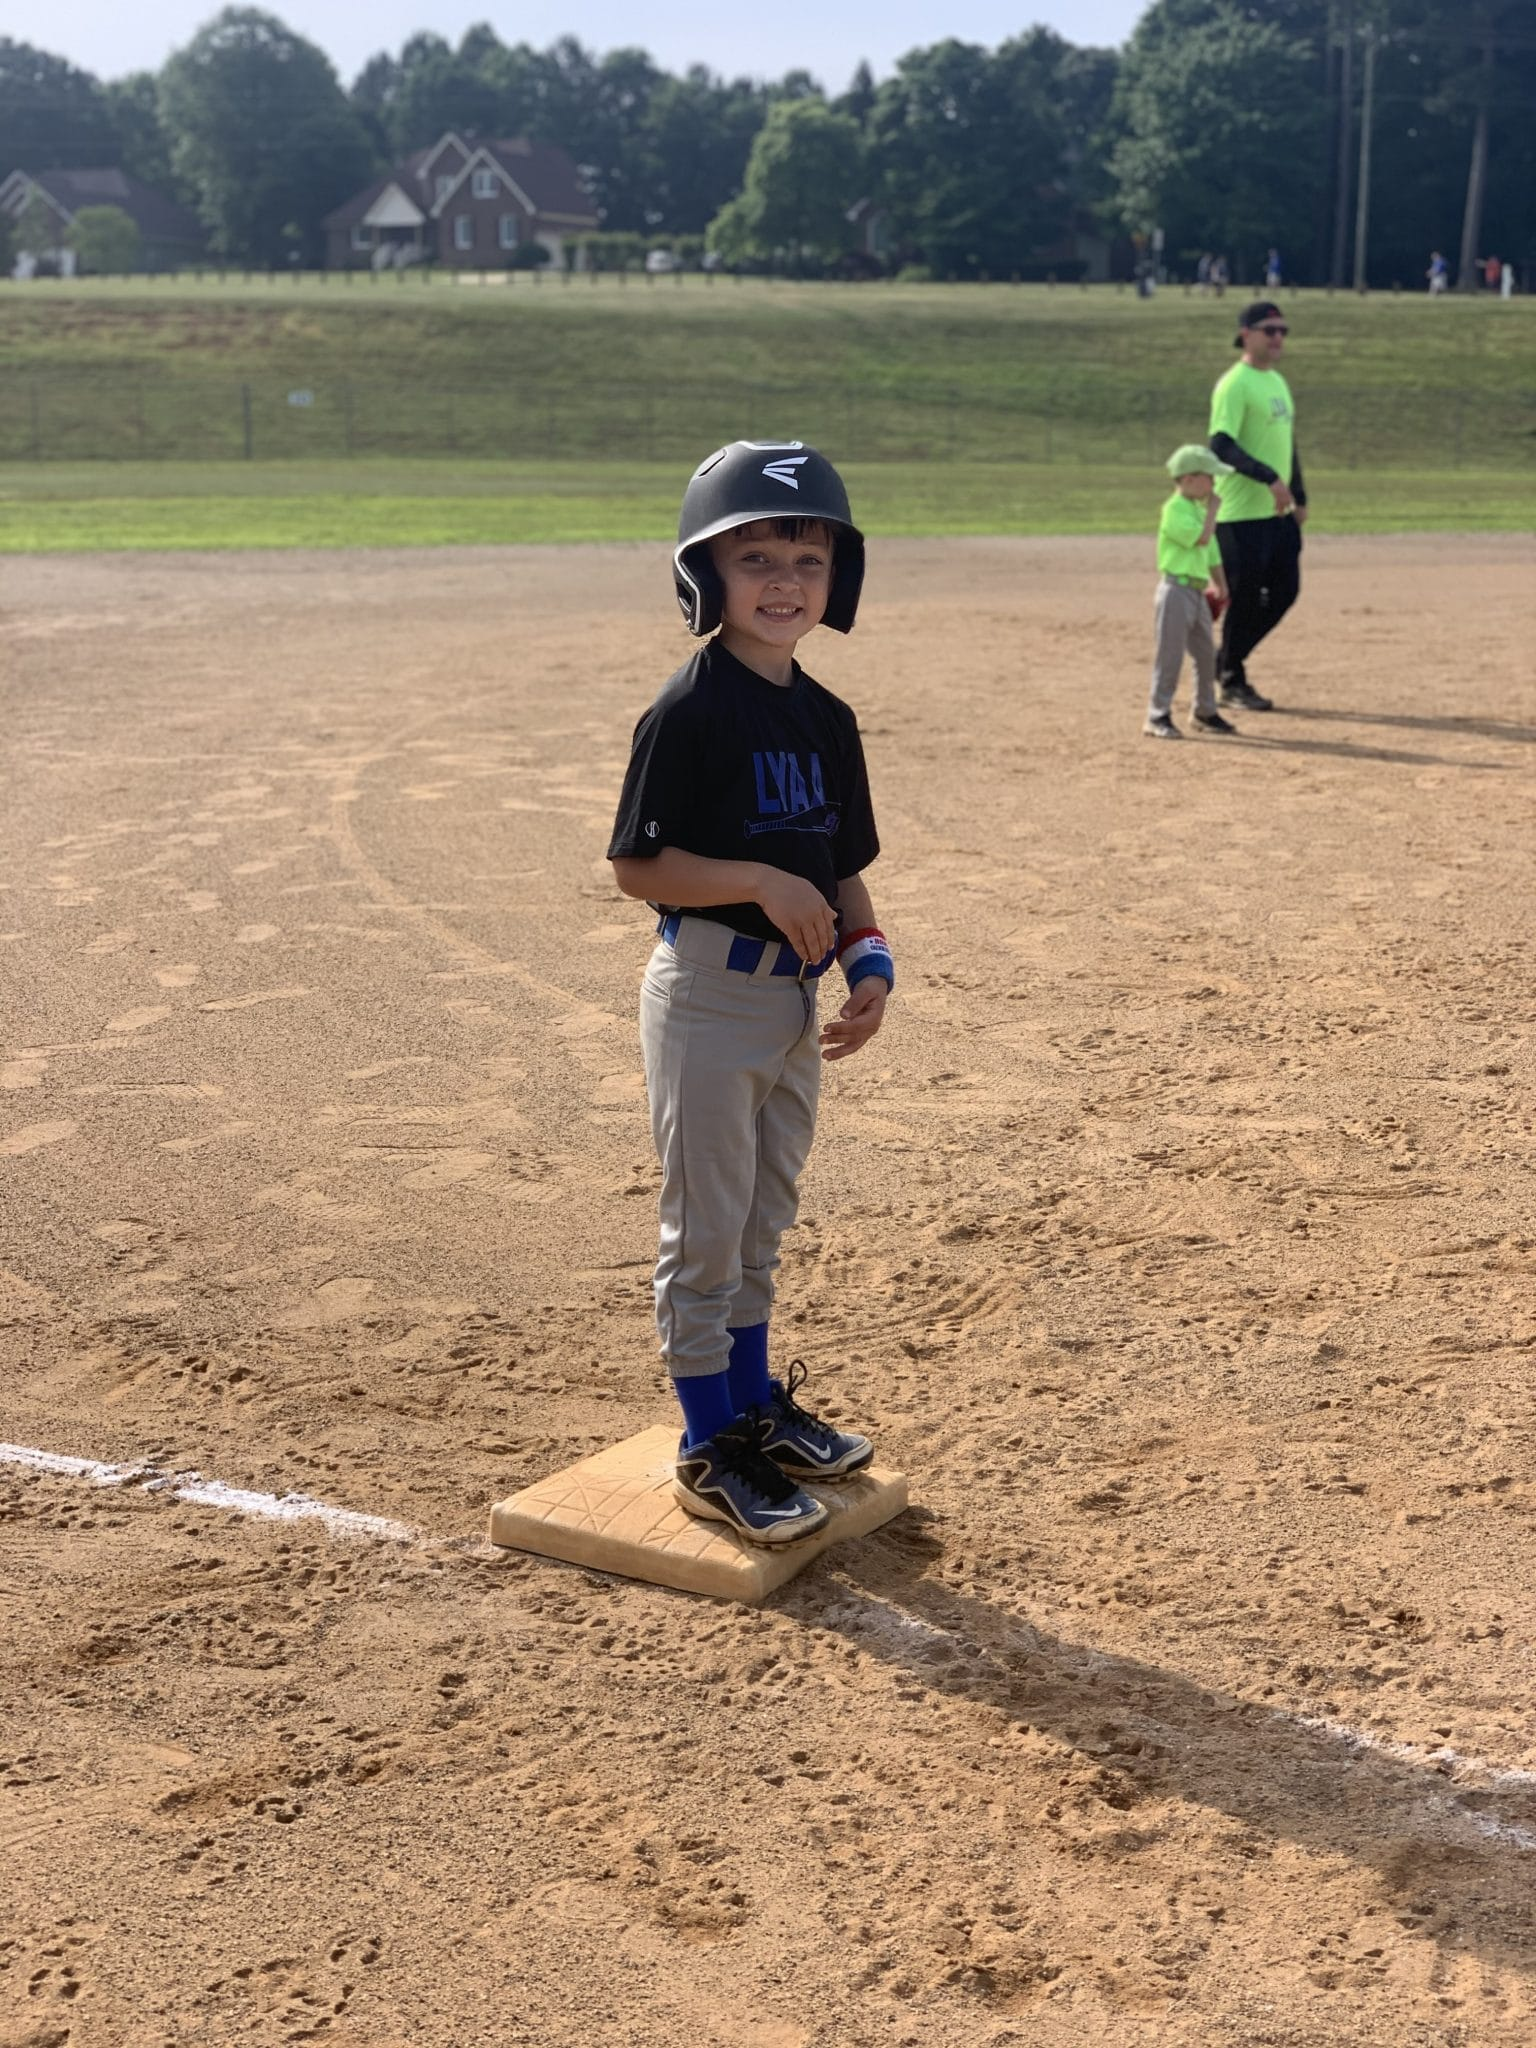 Lincoln Wey, Baseball season, Stilettos and Diapers, Lake Norman Baseball